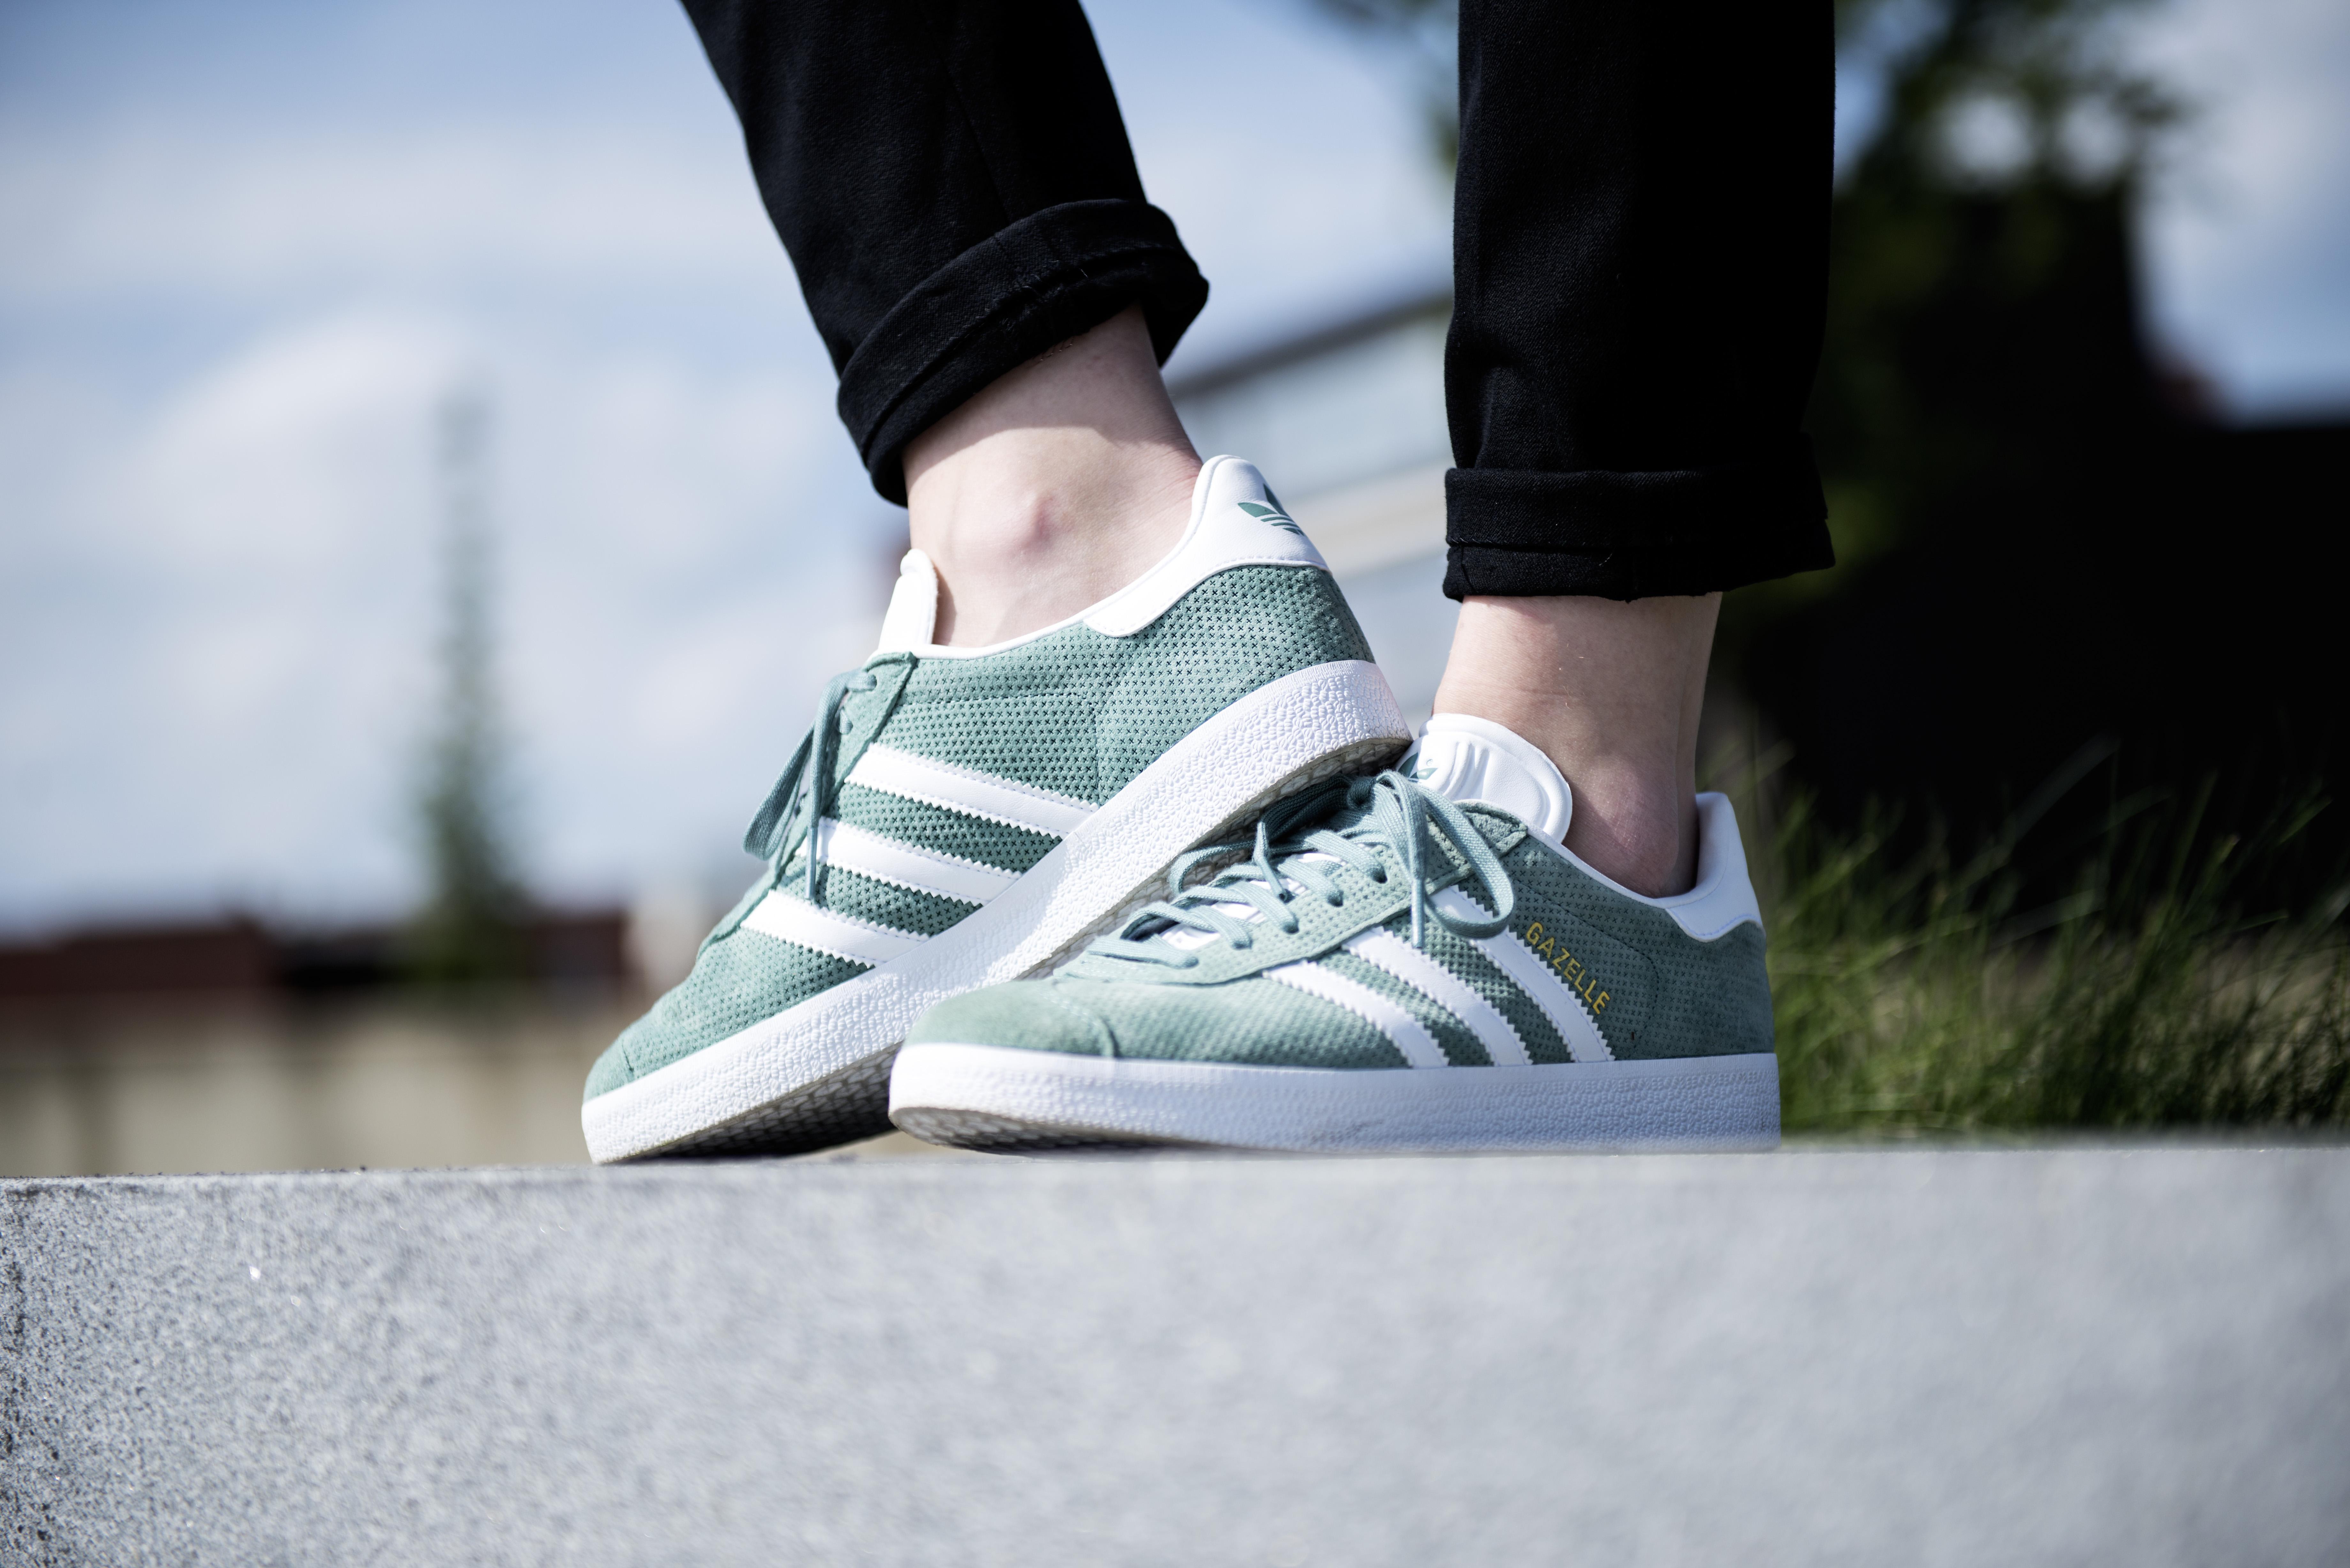 TAKE-OFF Sneakerstore - 10% korting